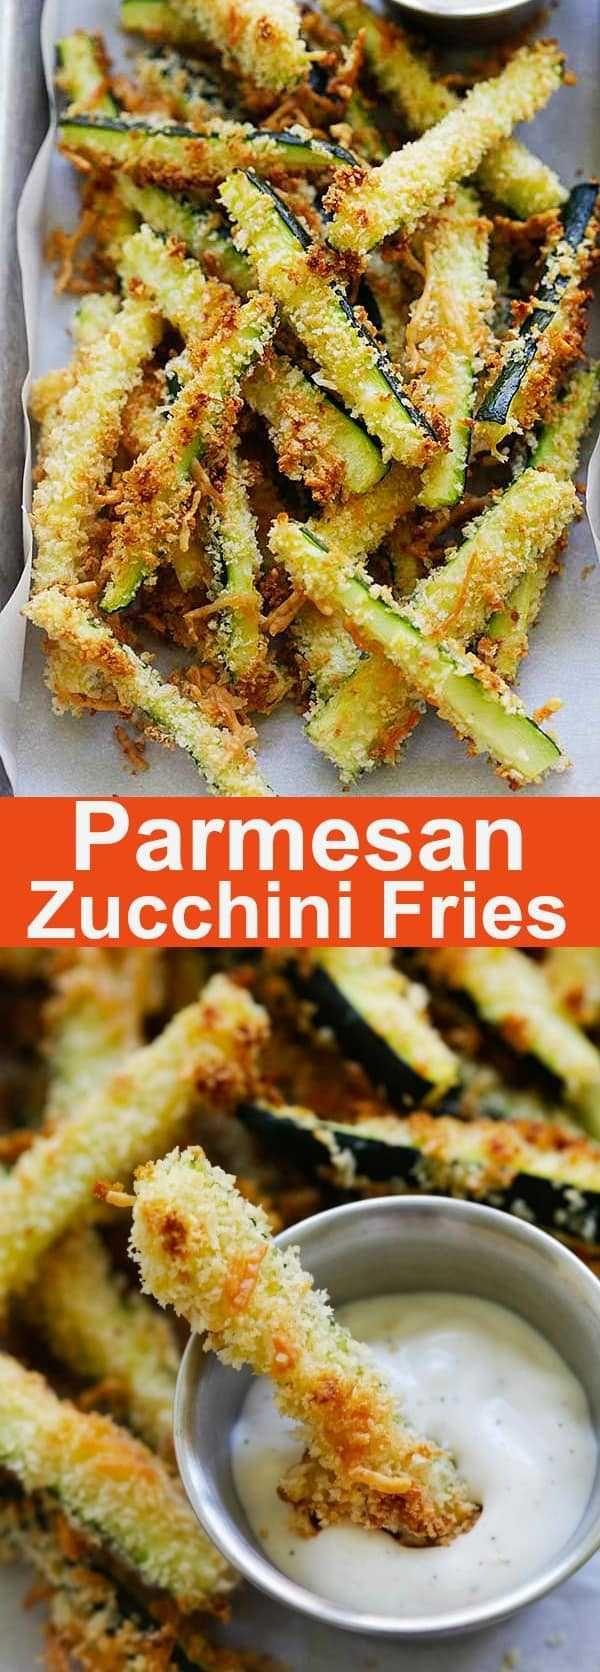 Parmesan Zucchini Fries (Healthy and Extra Crispy!) - Rasa Malaysia